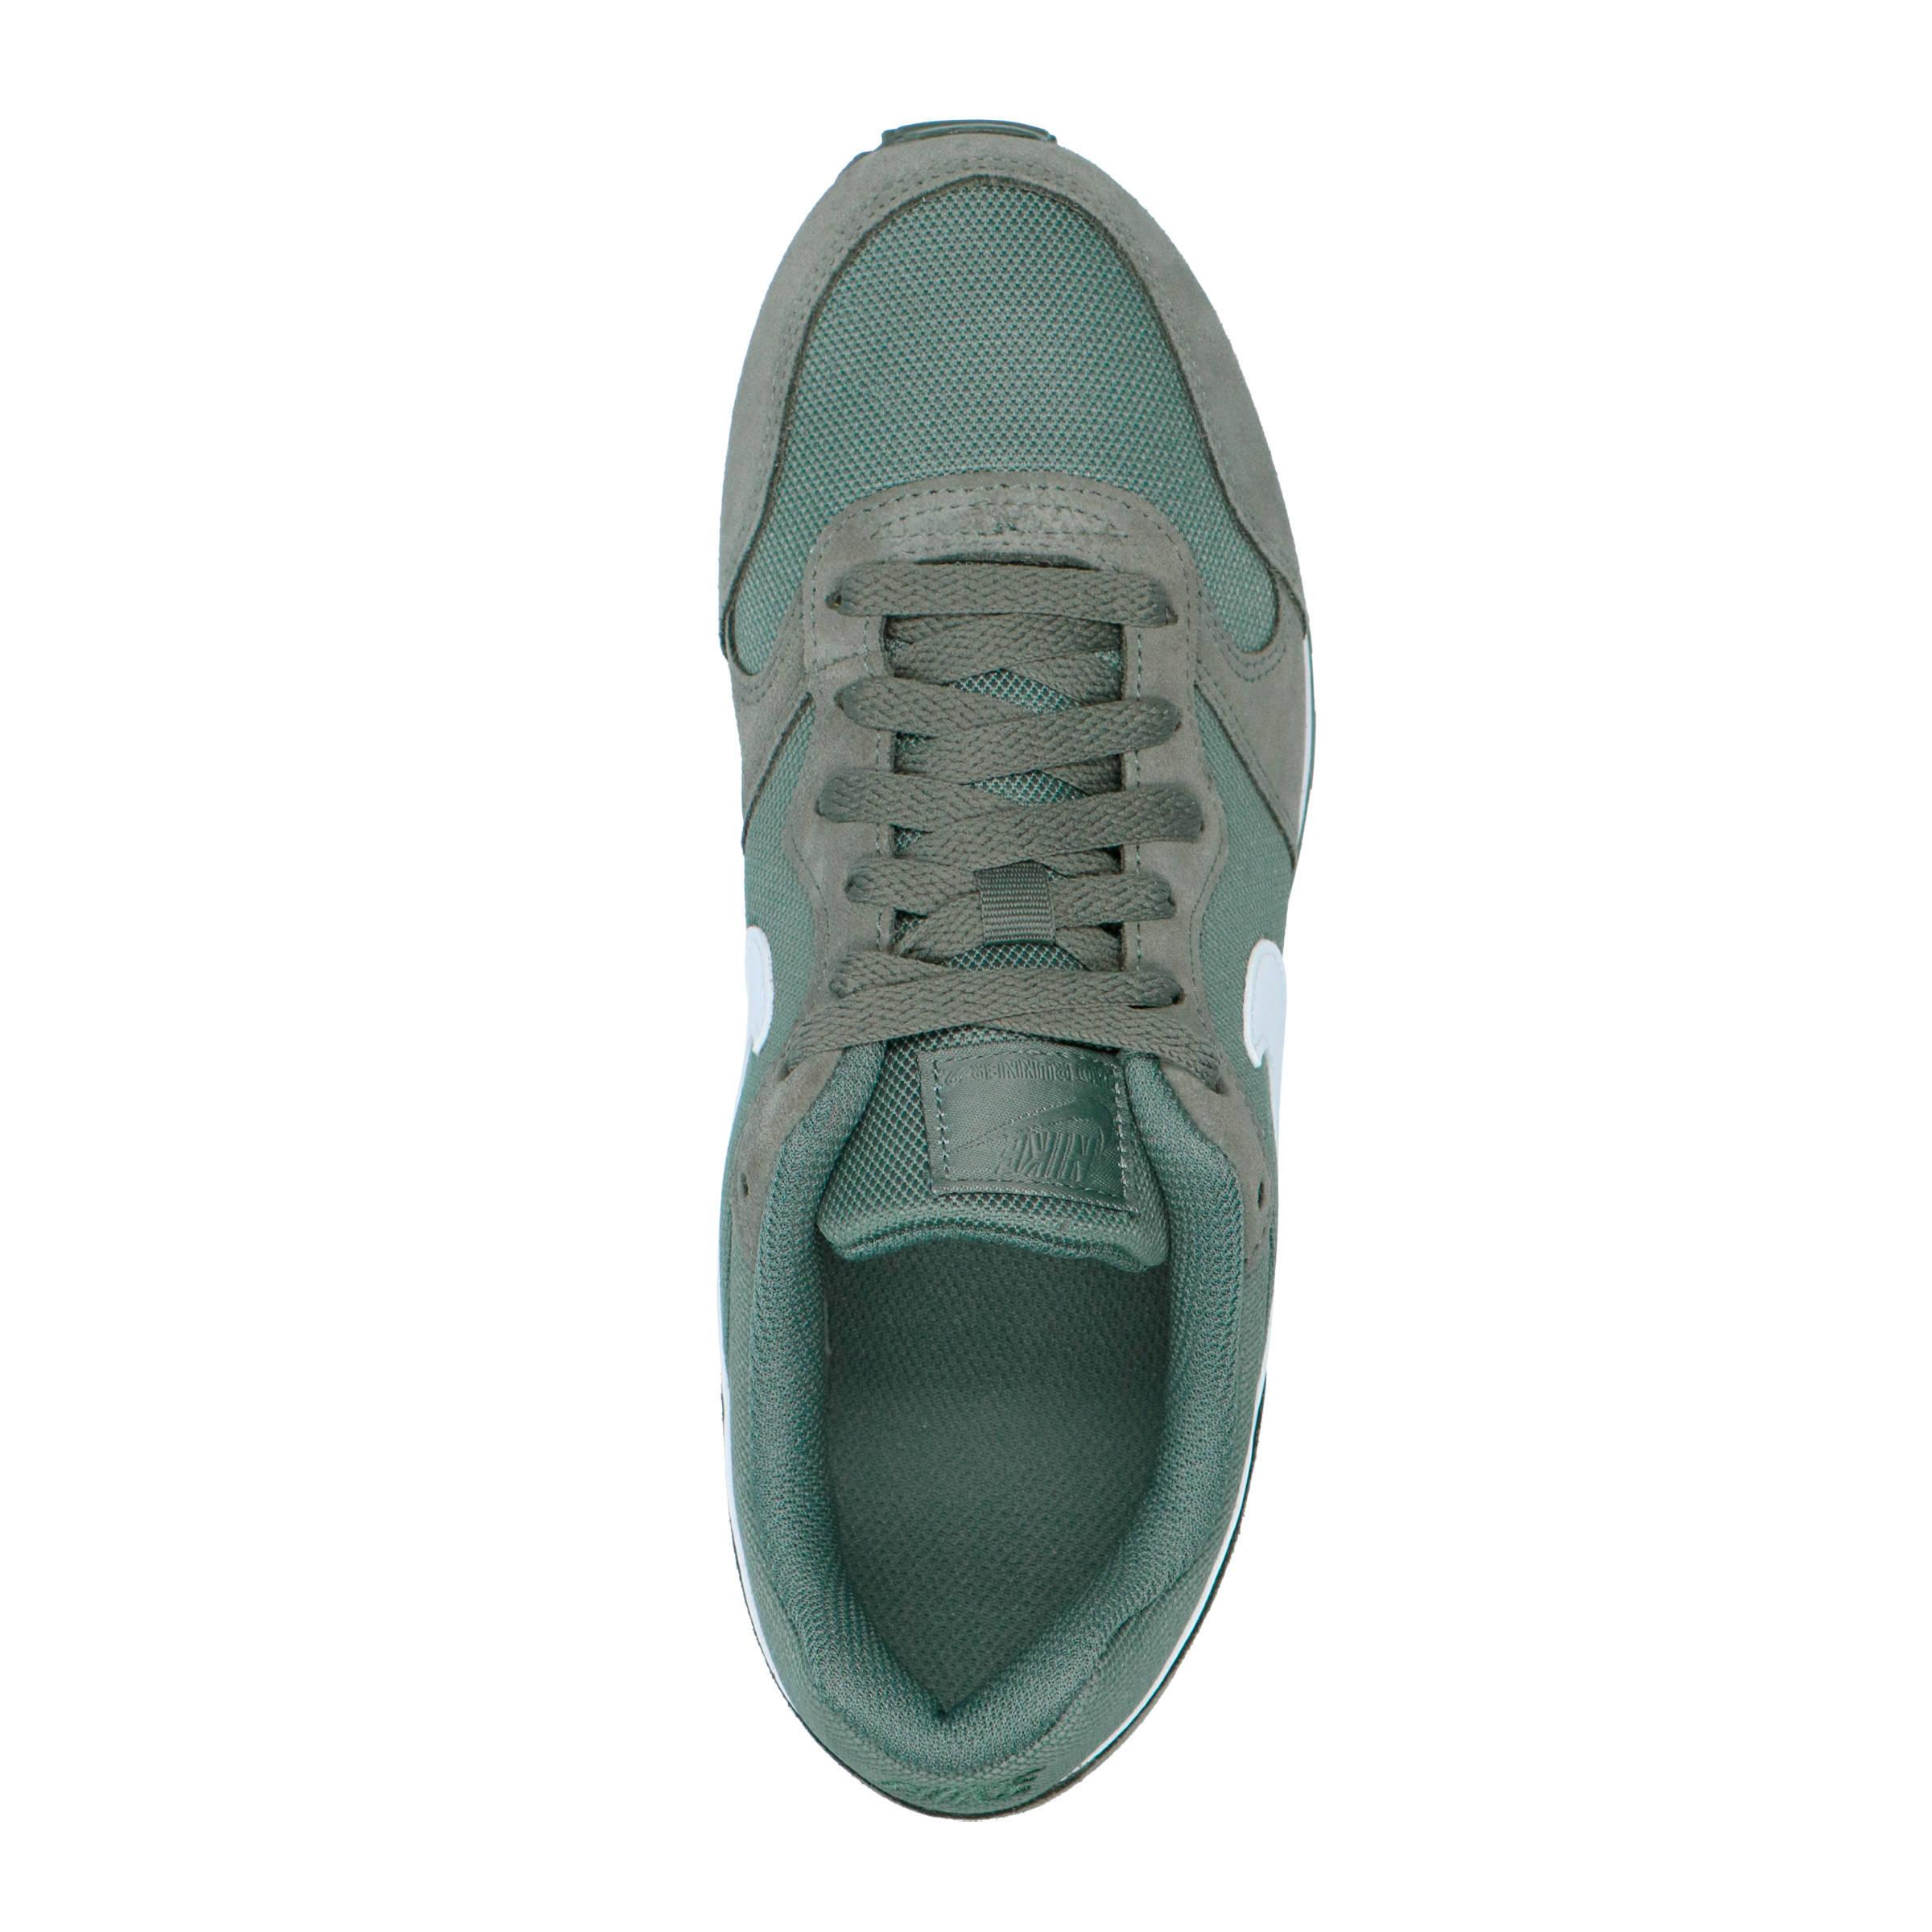 size 40 e714c d9df9 Nike MD Runner 2 PE sneakers groen grijs   wehkamp